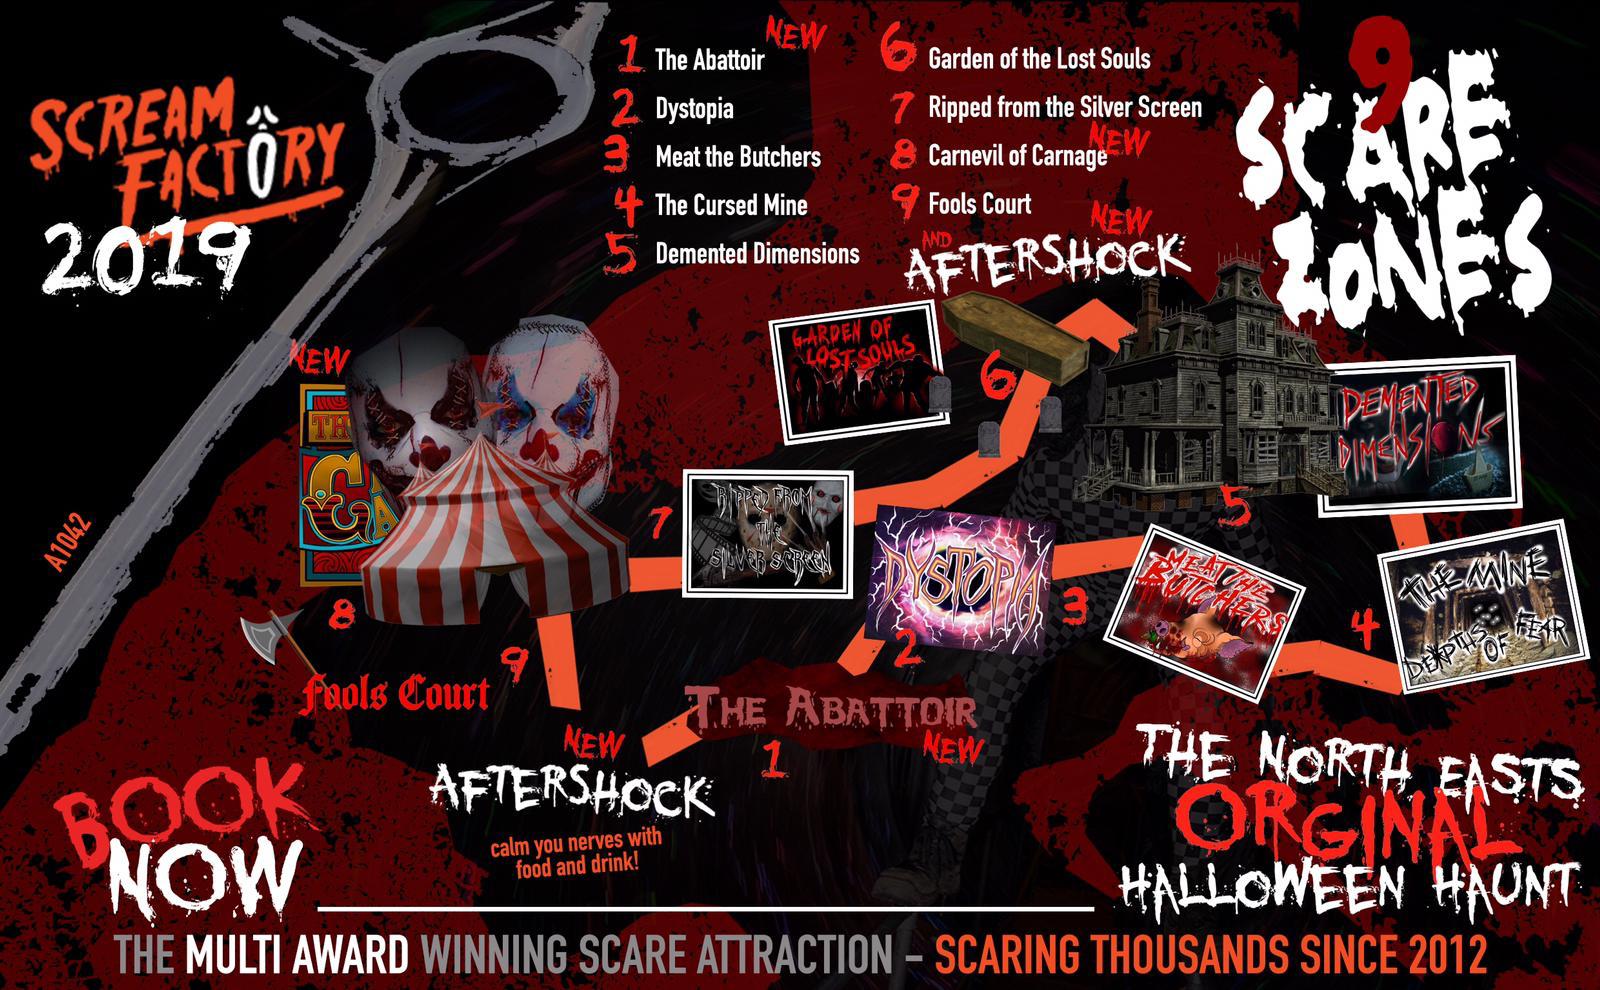 Scream Factory 2019 Map